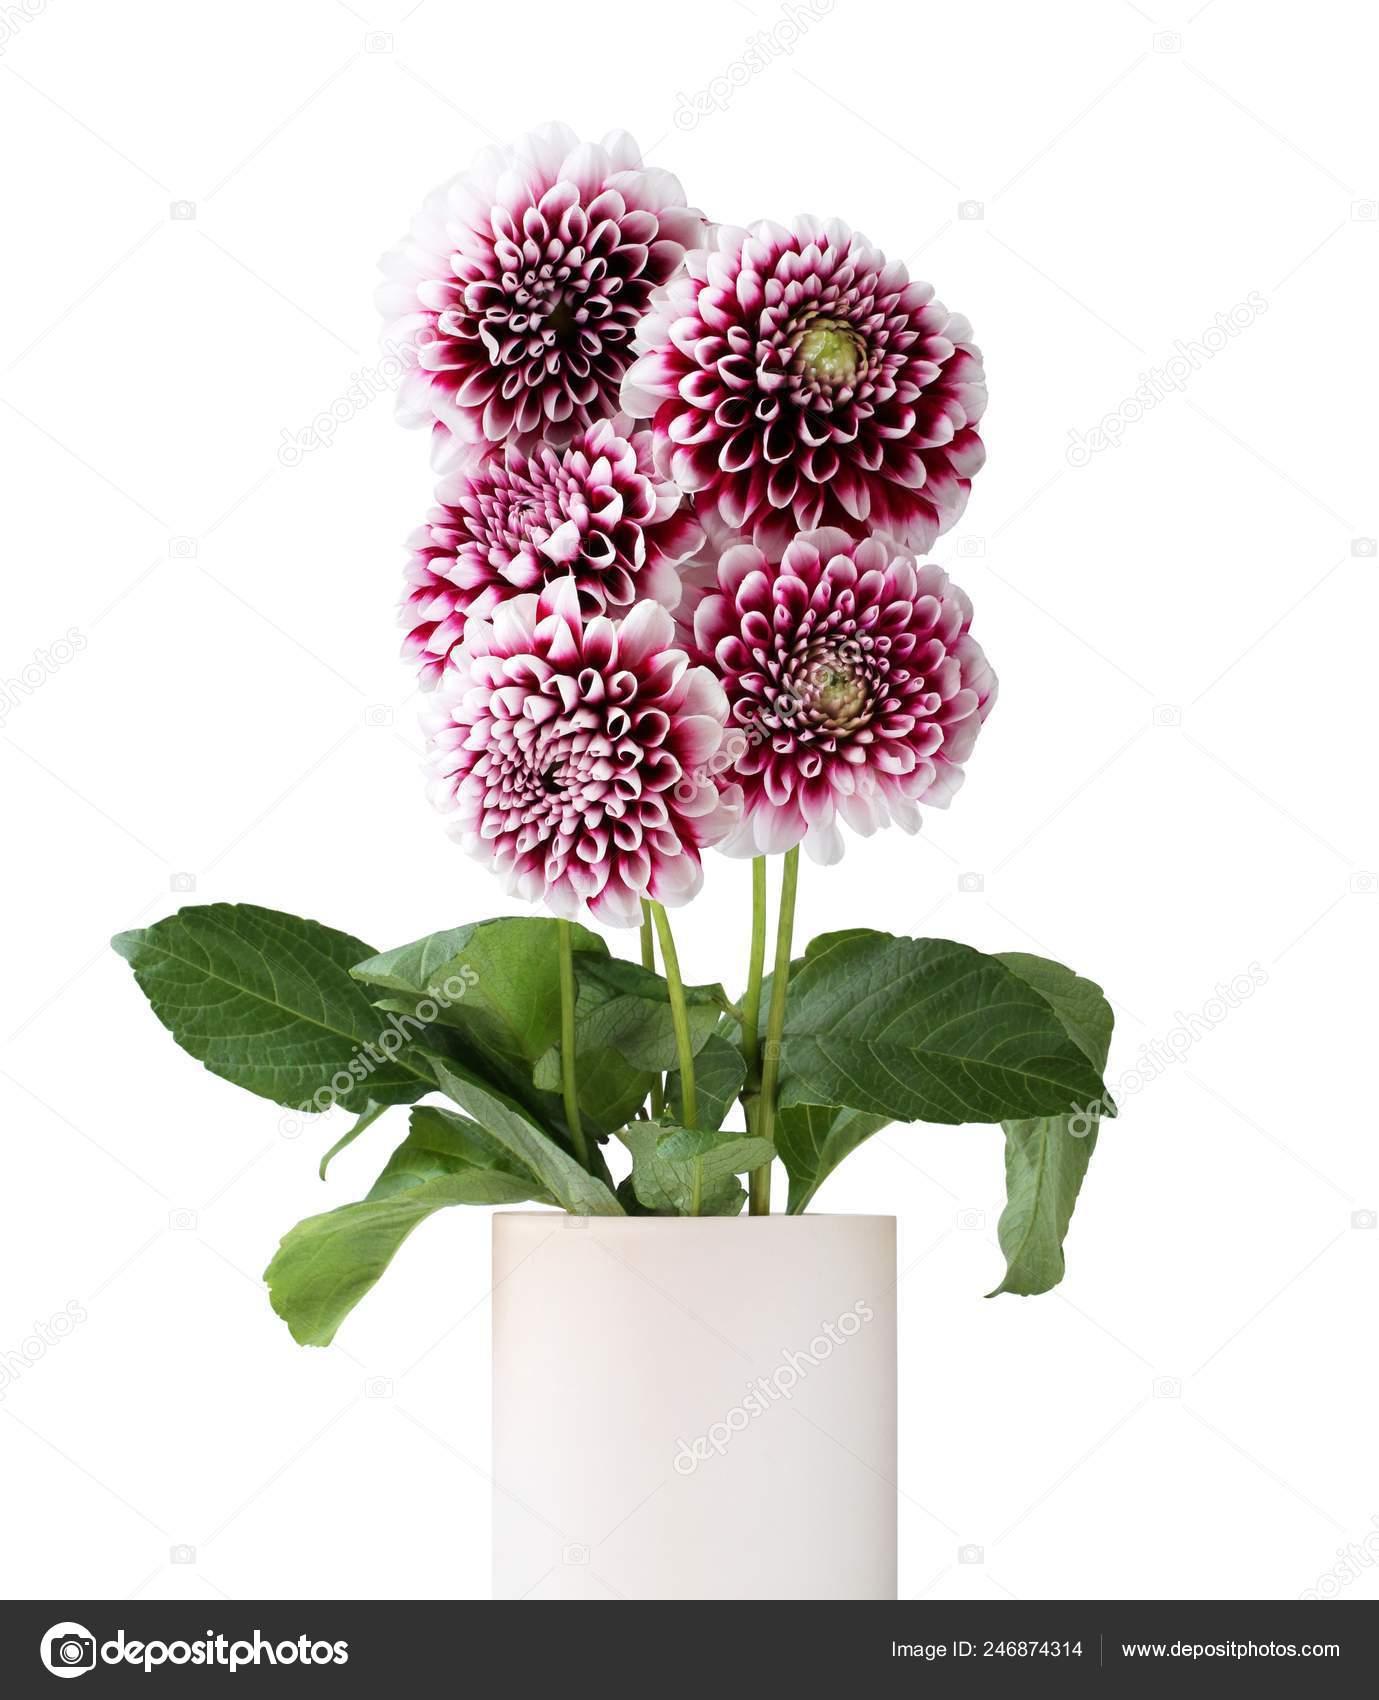 Bouquet Five Purple Dahlia White Edges Petals Flowers Isolated White Stock Photo C M Photographer 246874314